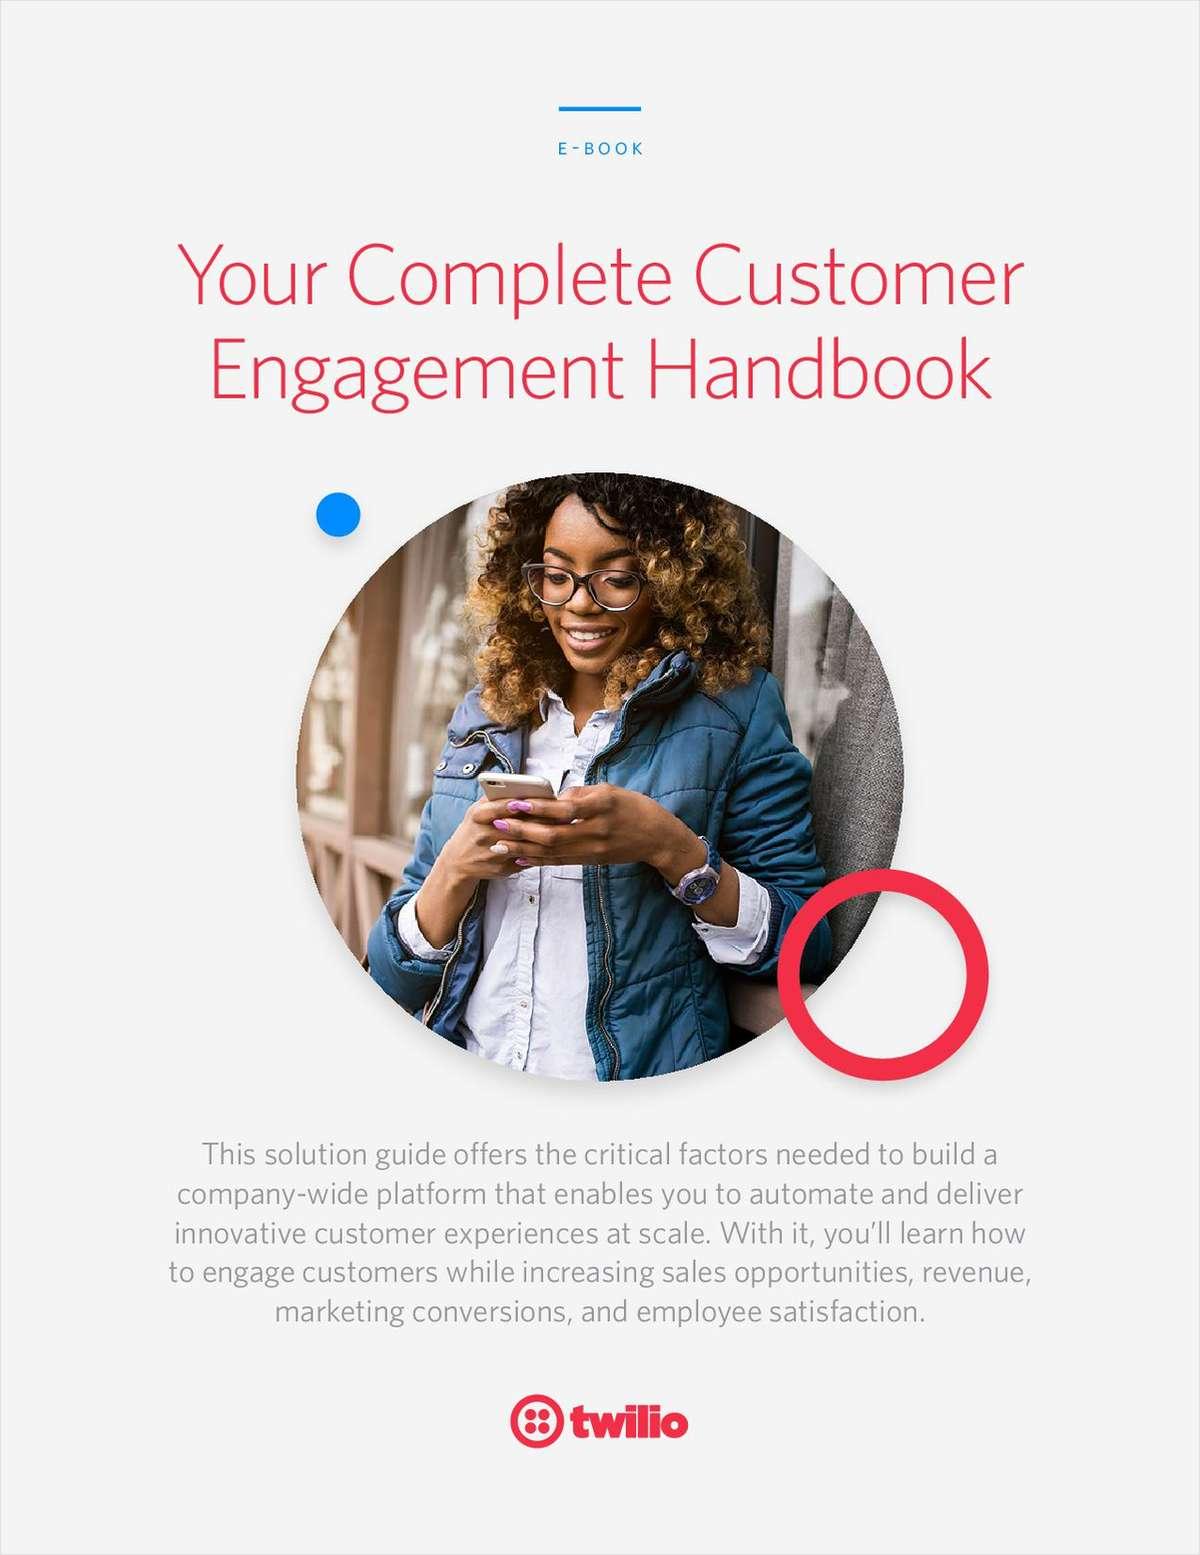 Your Complete Customer Engagement Handbook